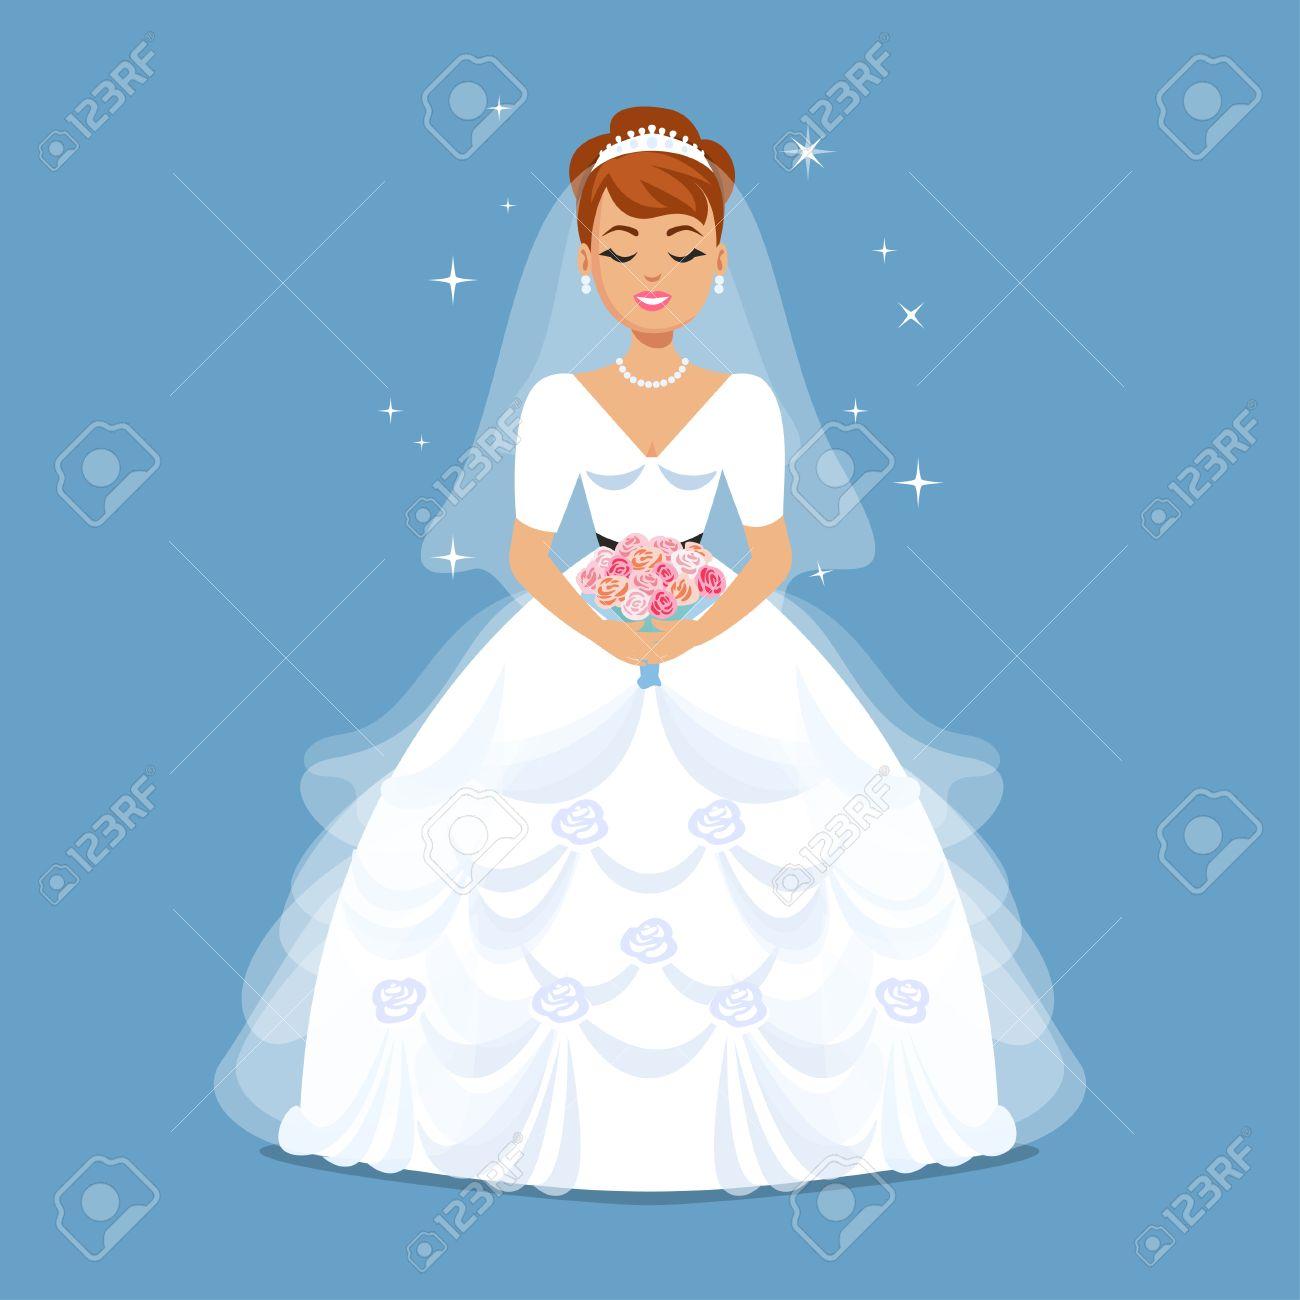 Elegant Bride In Wedding Dress In Classic, Retro, Vintage Styles ...